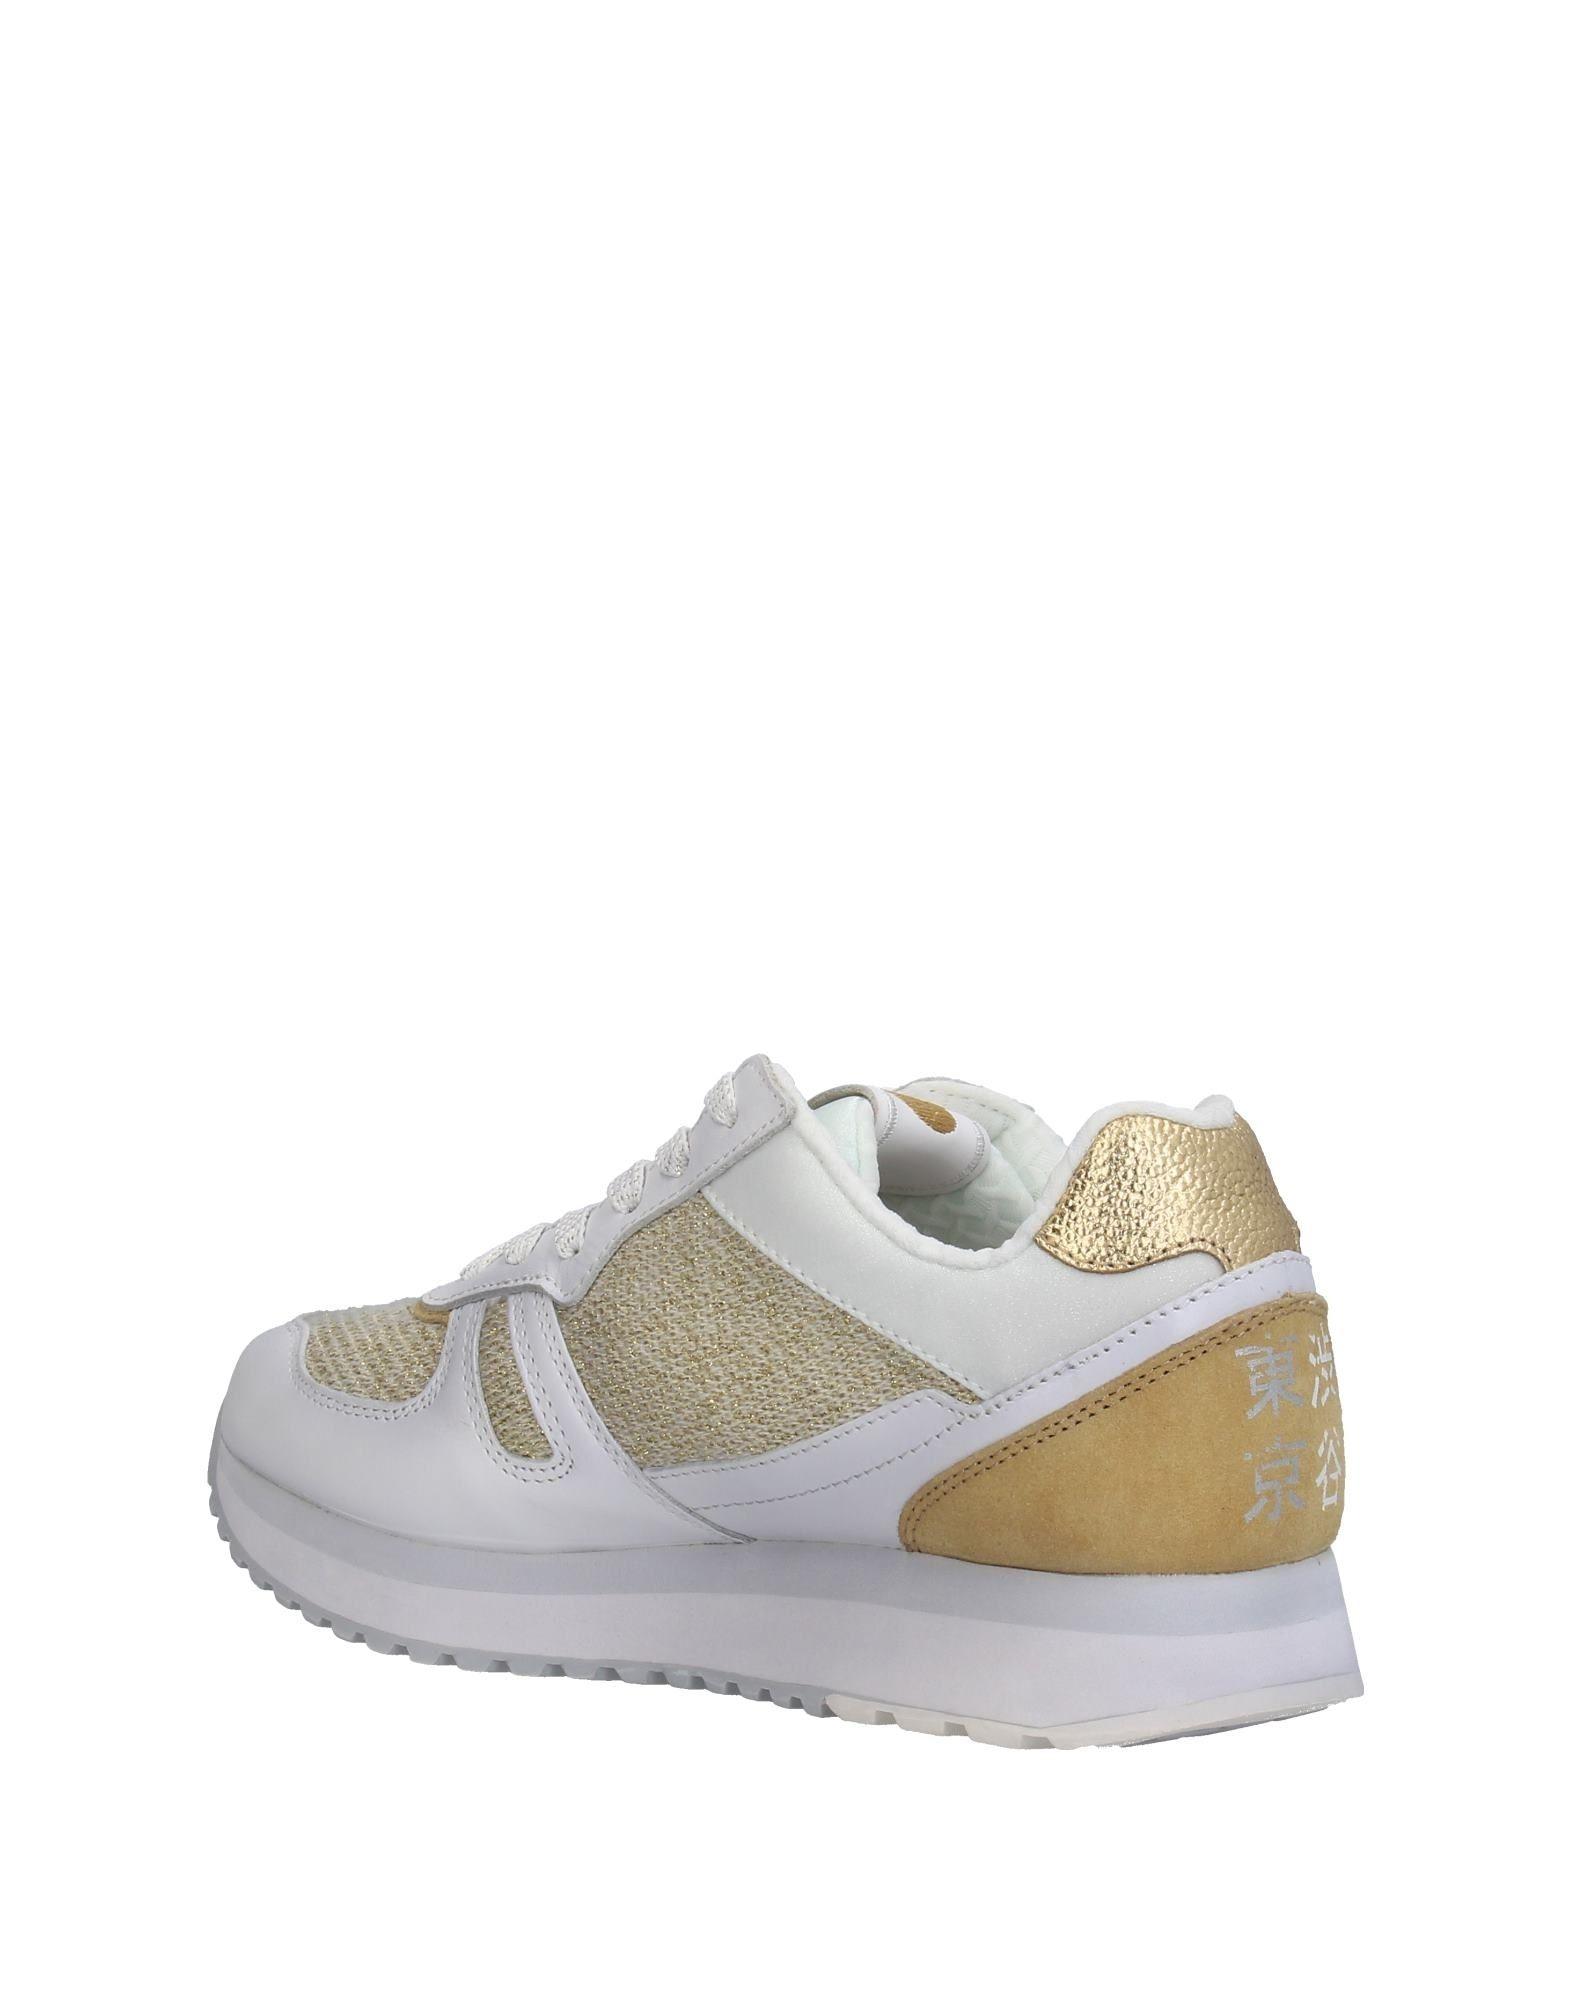 Lotto Leggenda Sneakers  Damen  Sneakers 11351292LX Gute Qualität beliebte Schuhe 4ddbc3